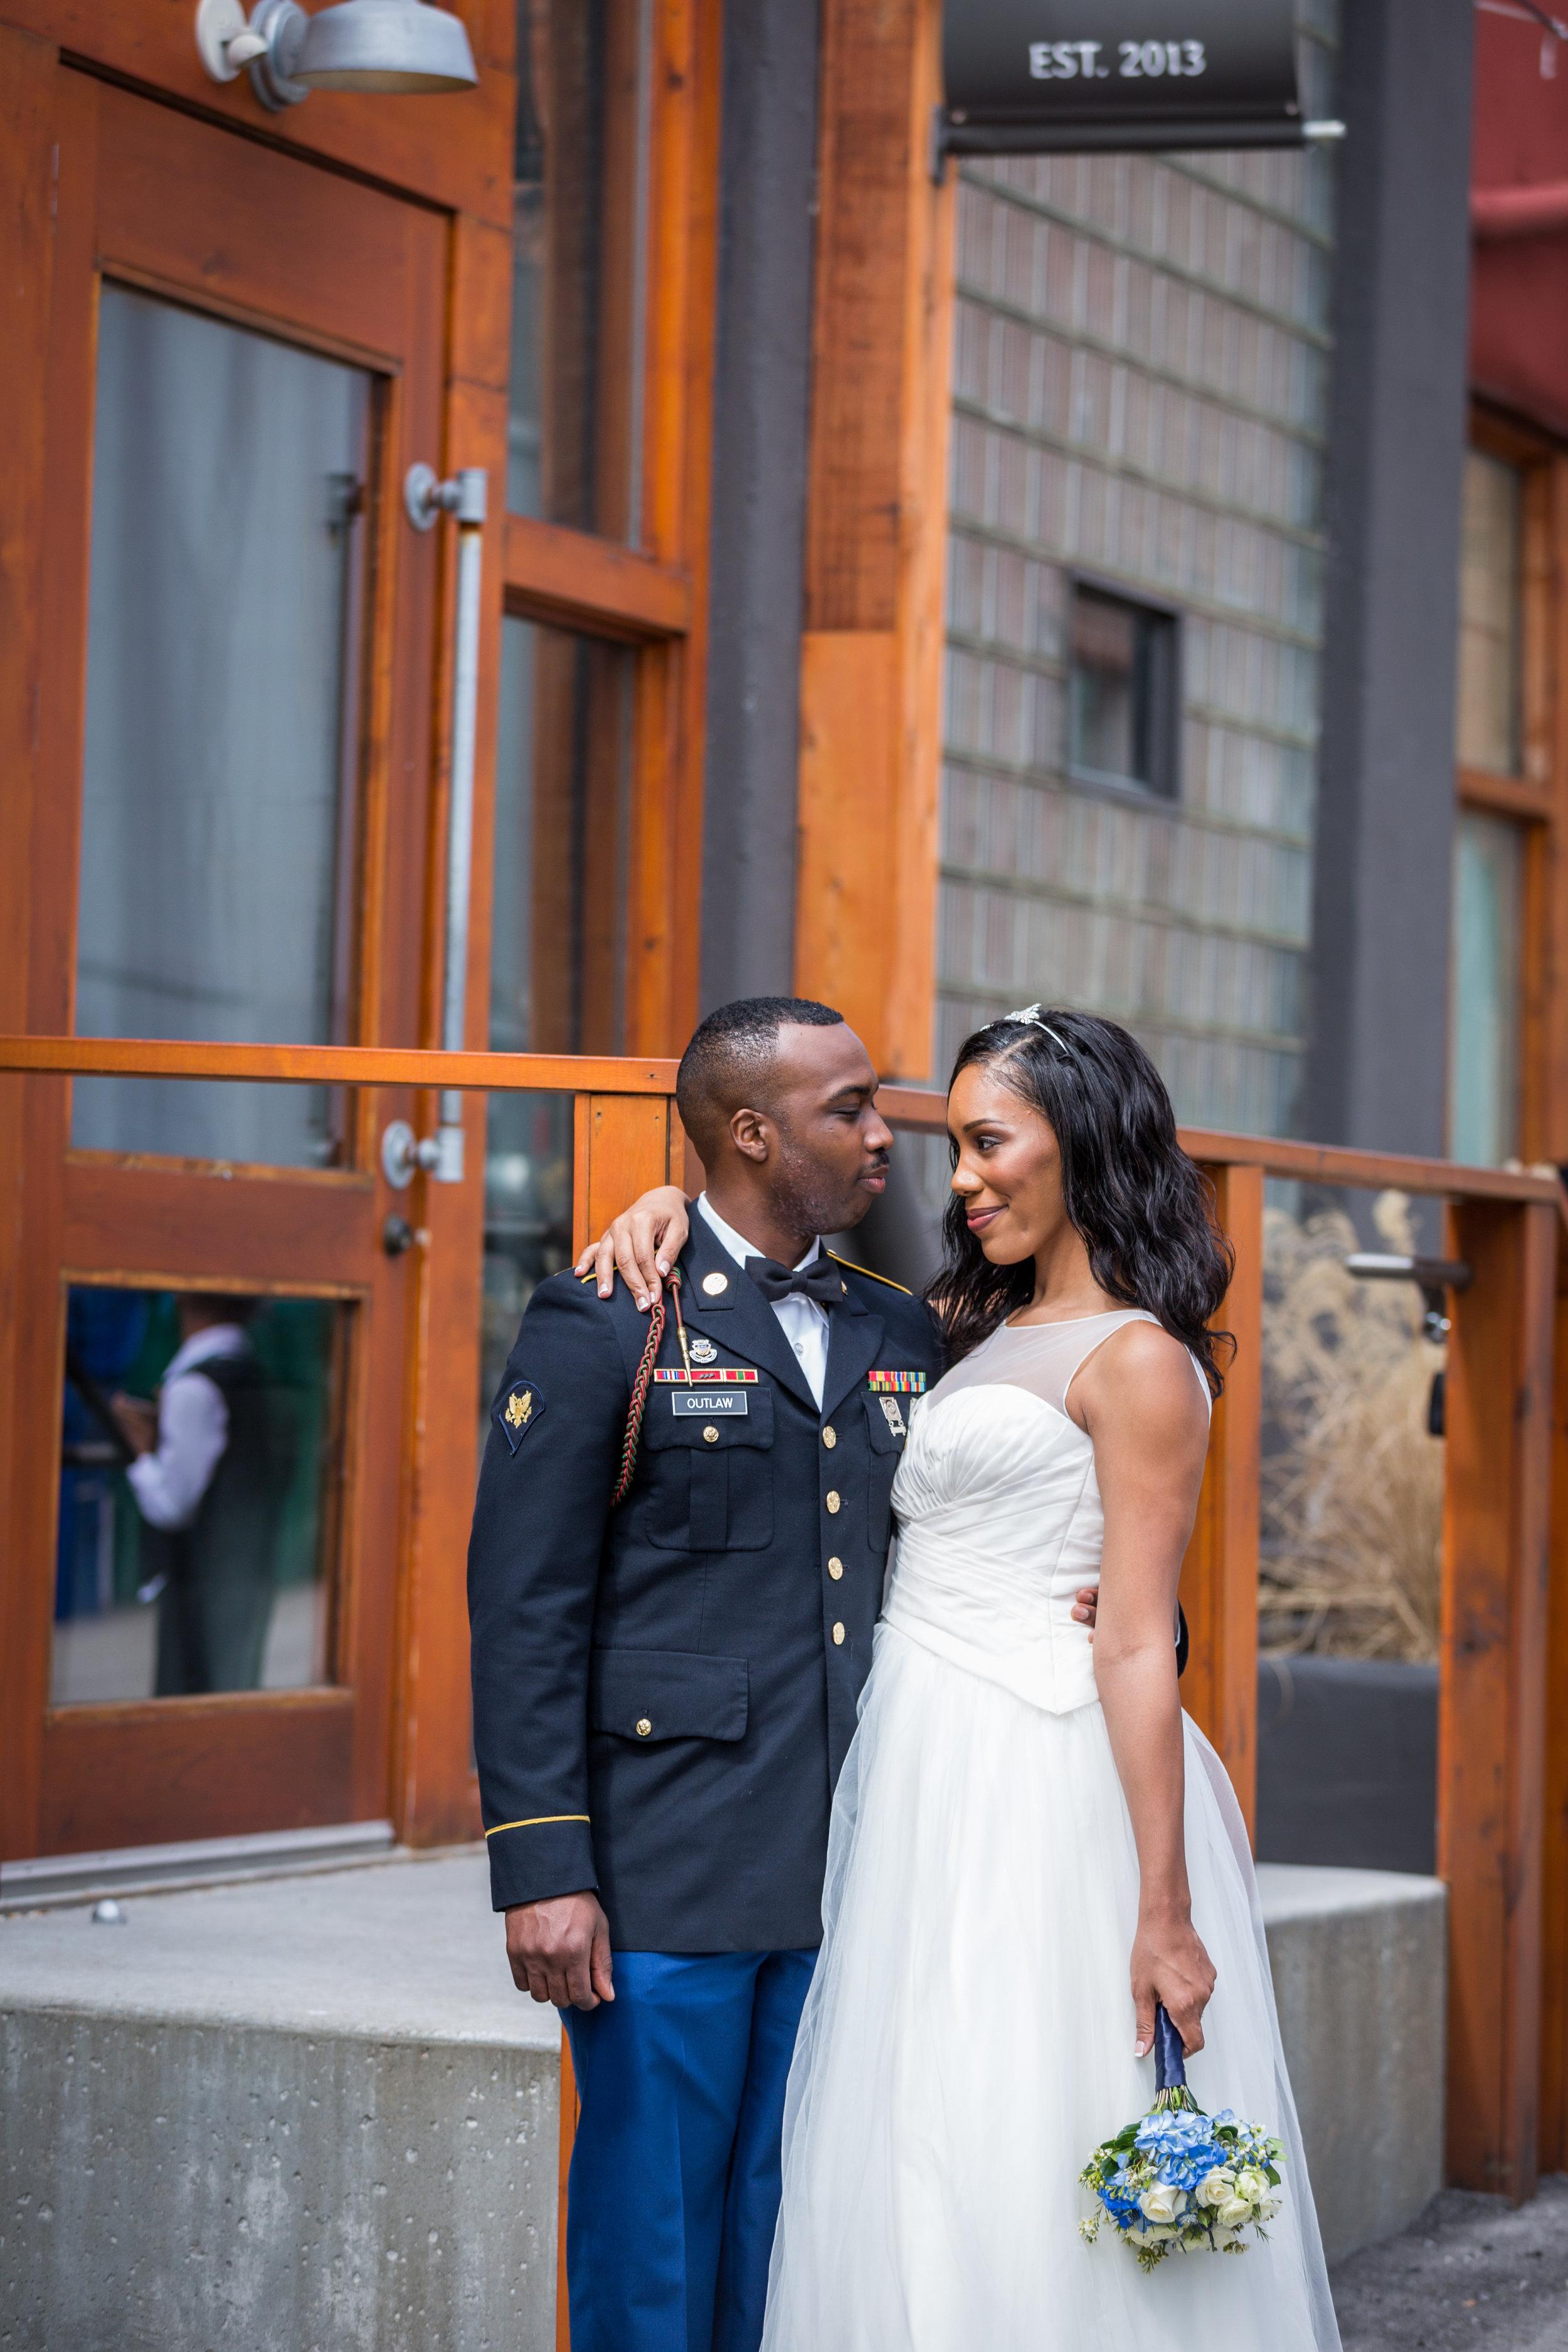 Kansas+City-Small+Wedding_Venue_Elope_Intimate_Ceremony_Memorial+Day_12.jpg